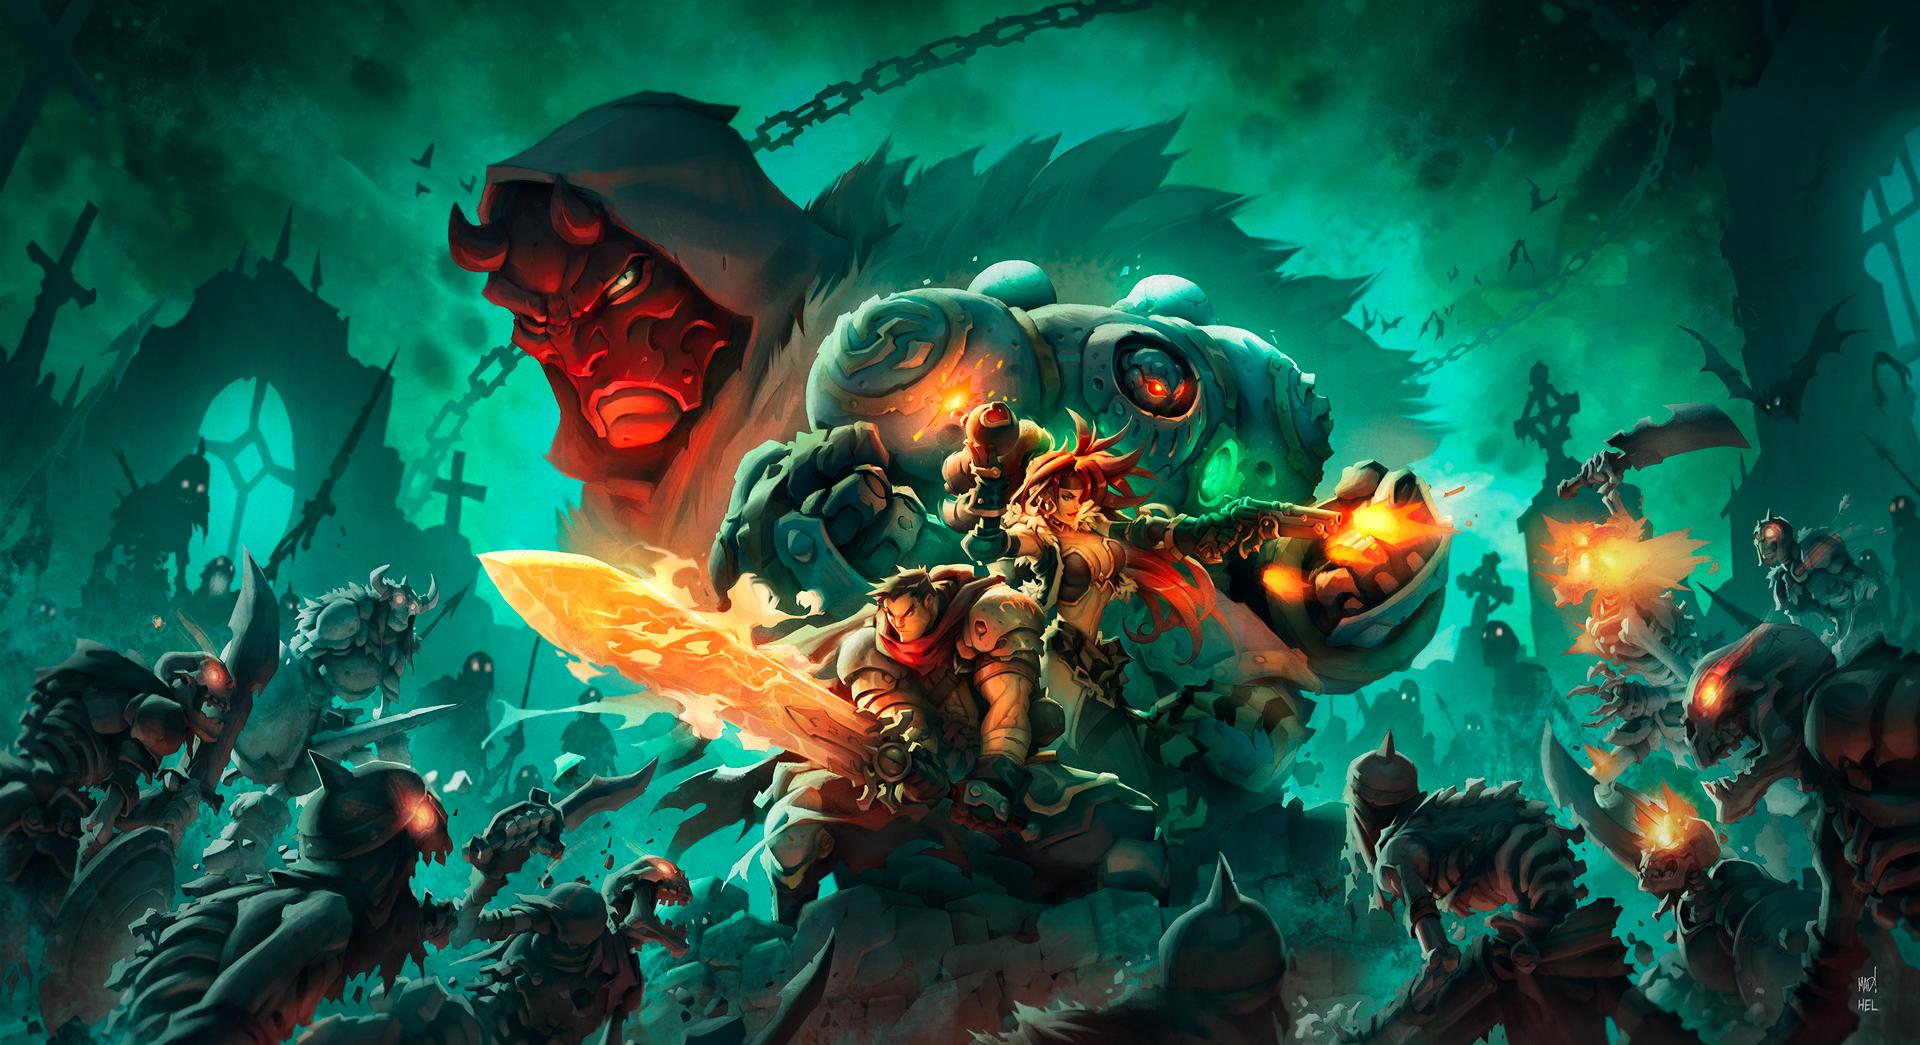 Exclusive Kickstarter Wallpaper Battle Chasers